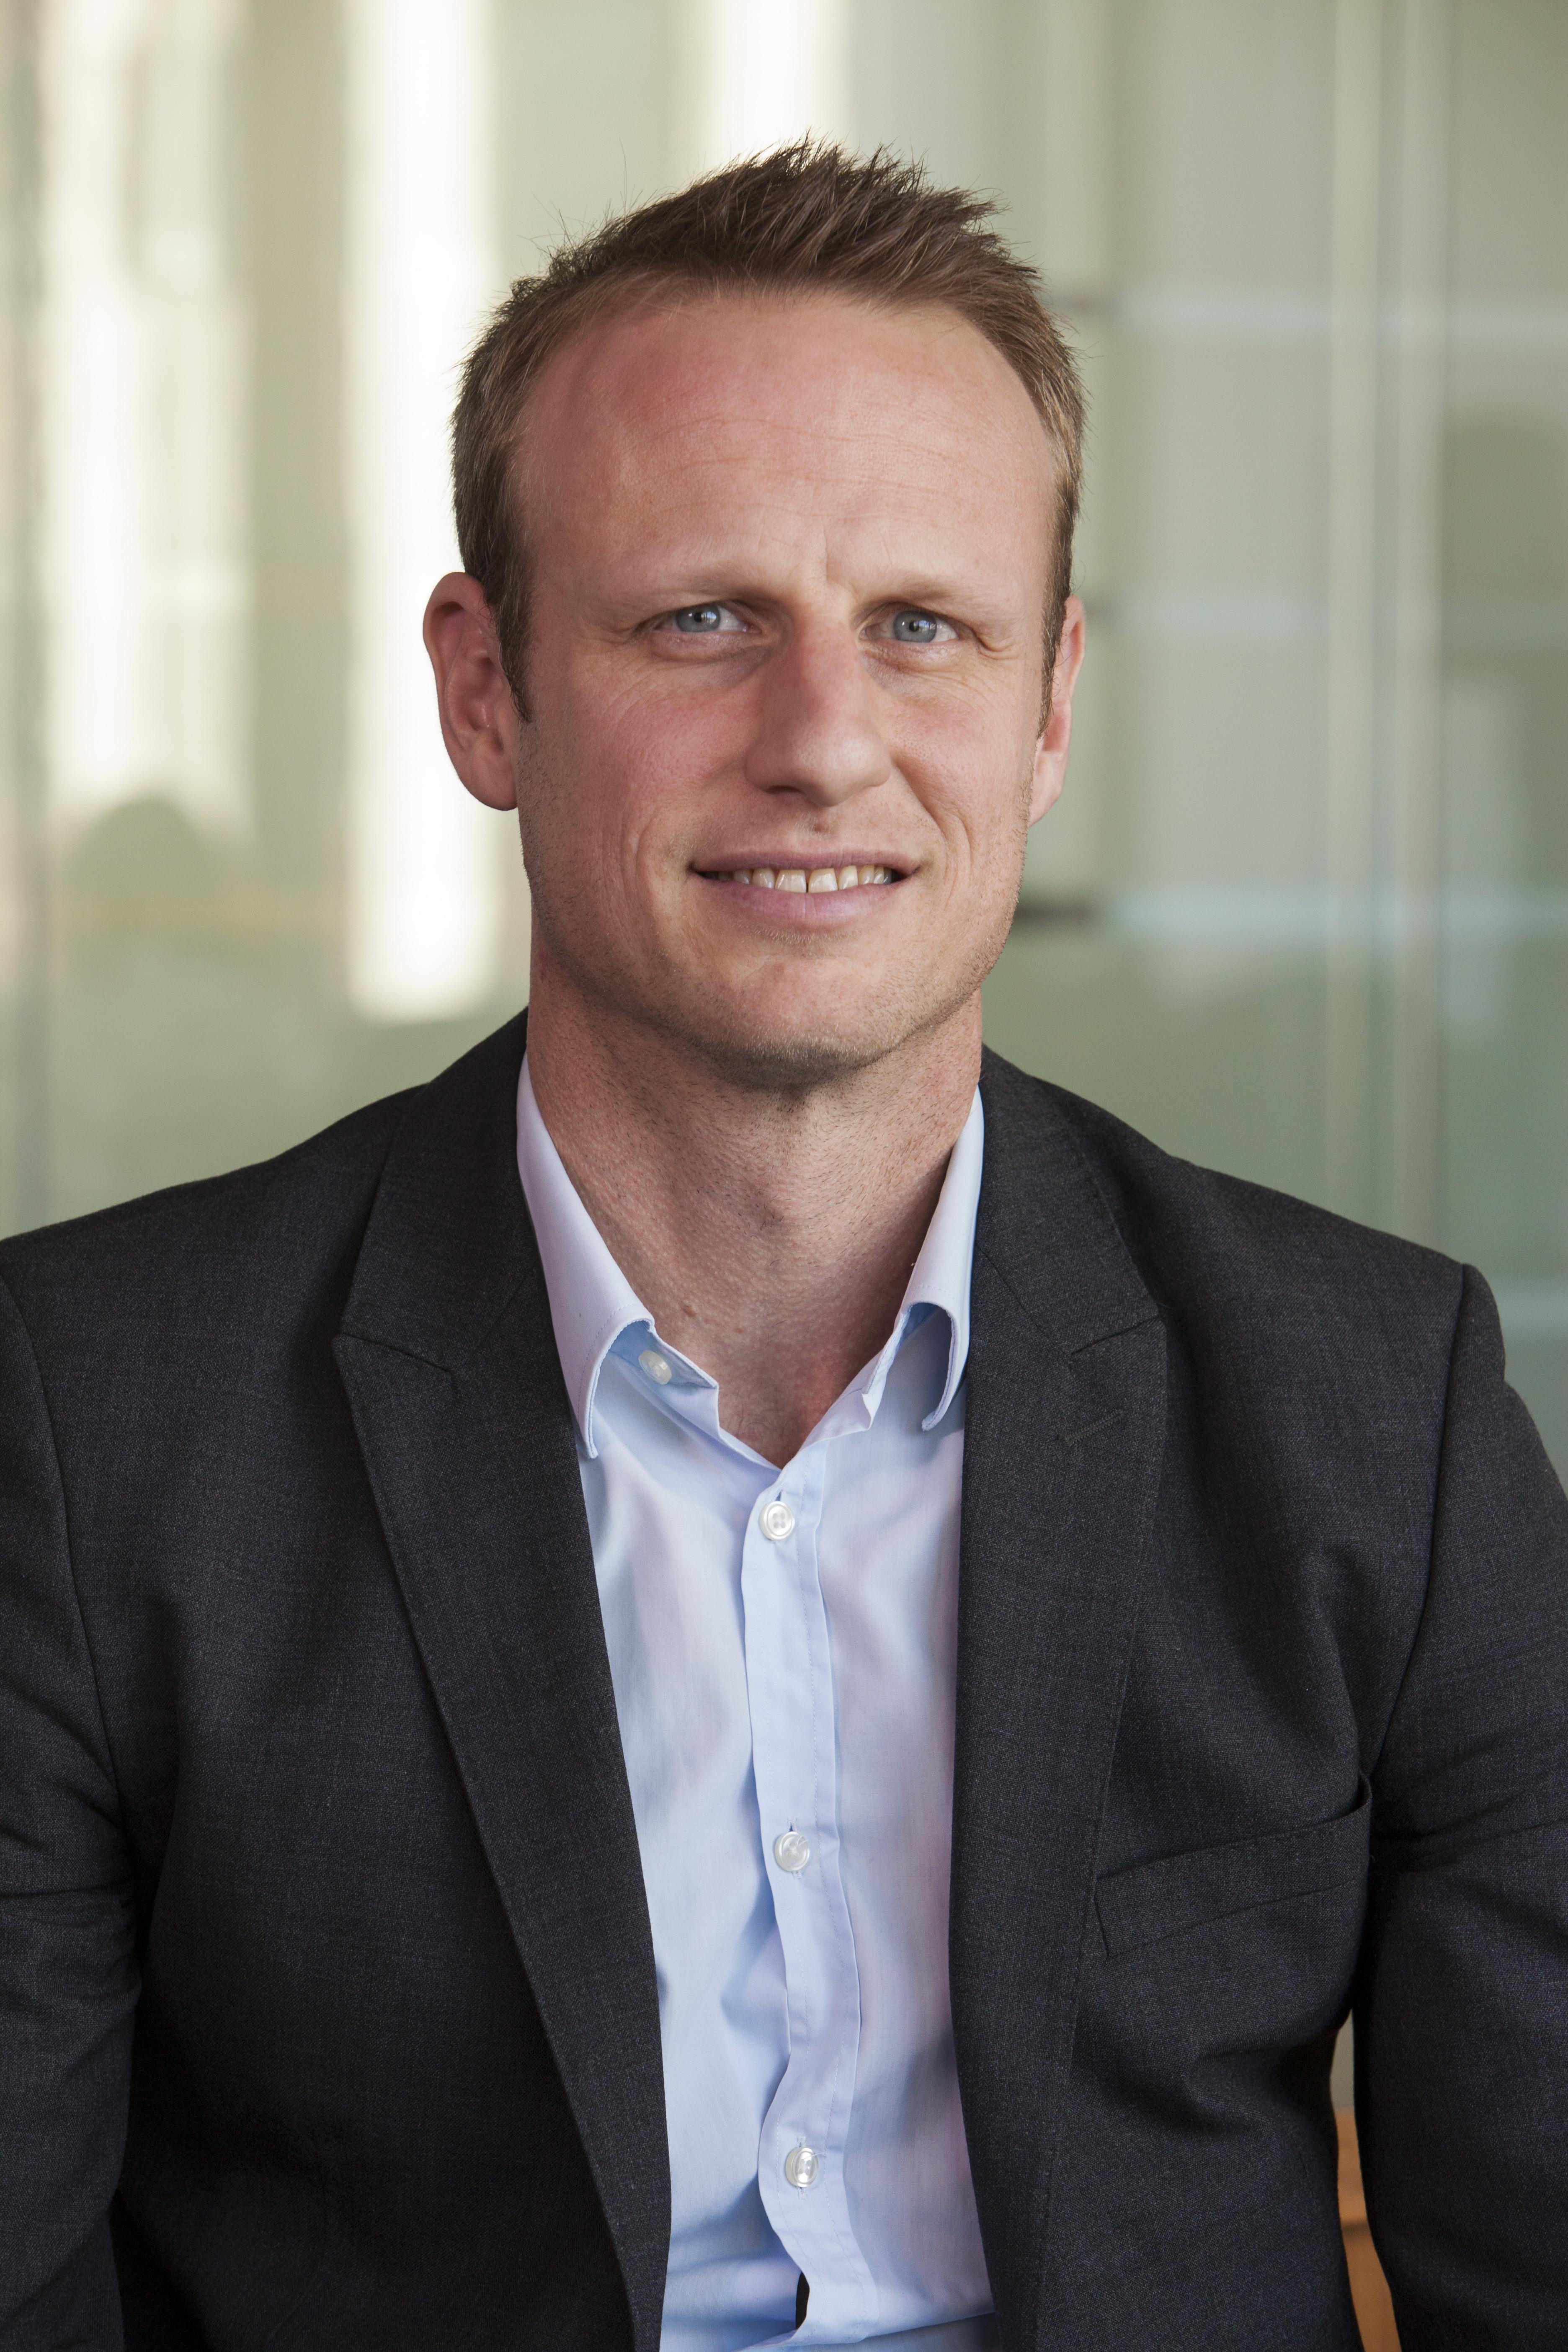 Nicholas McQuire,vice president, Enterprise, CCS Insight